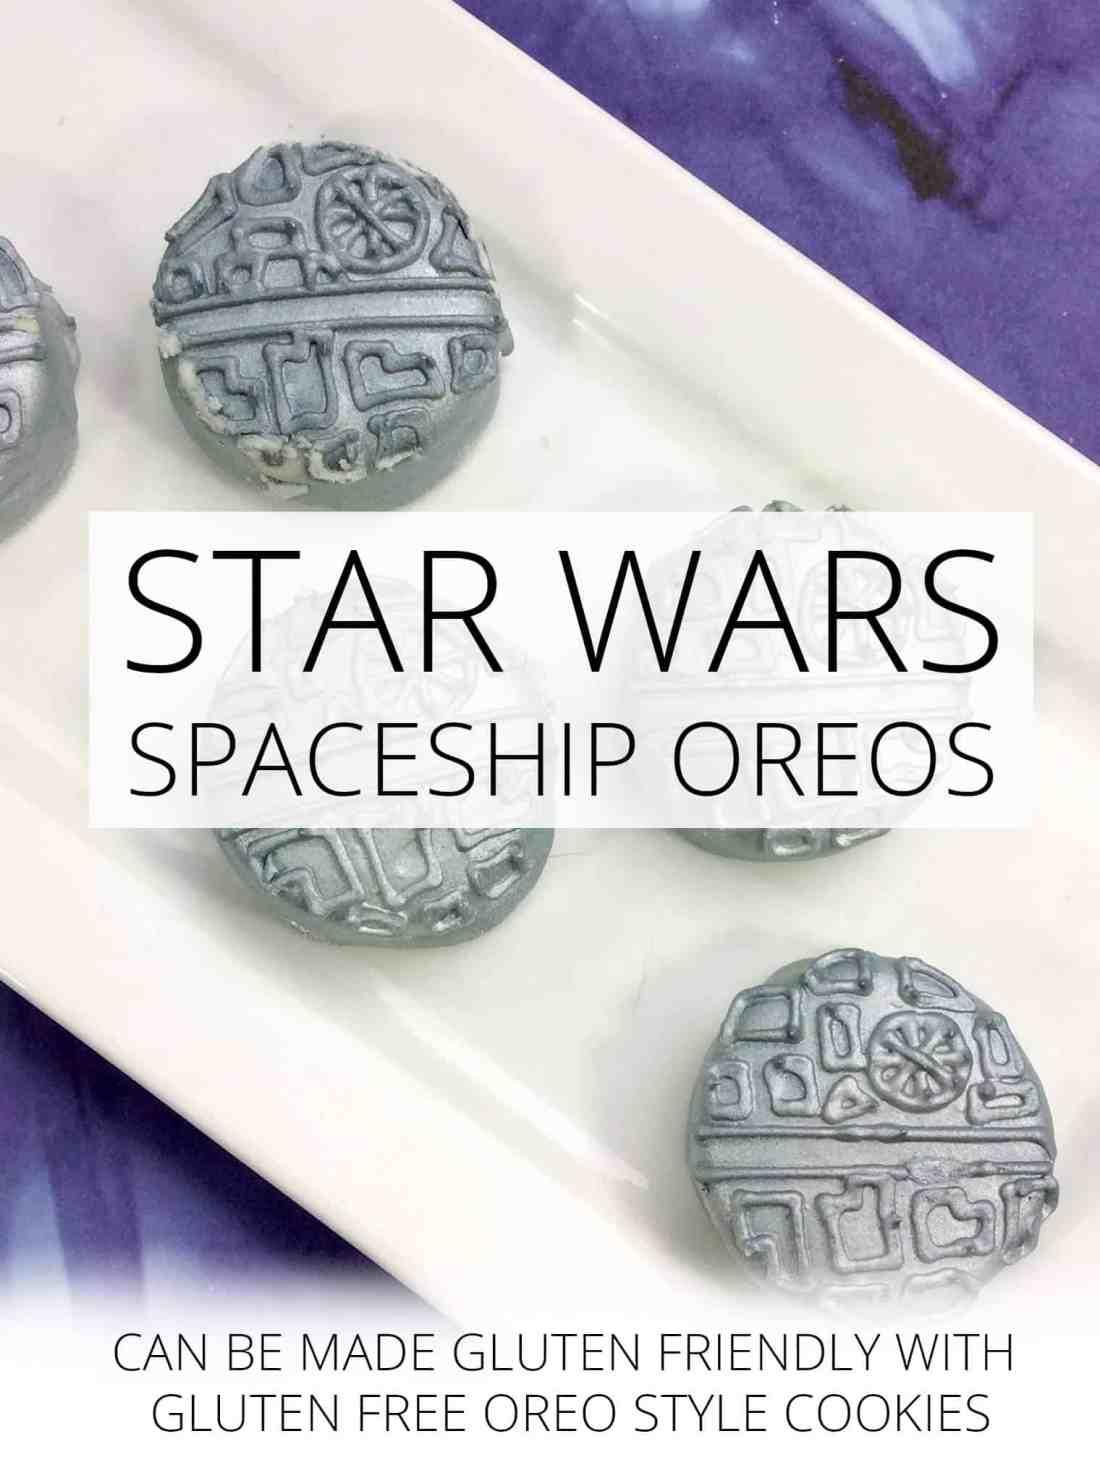 Star Wars Spaceship Oreos